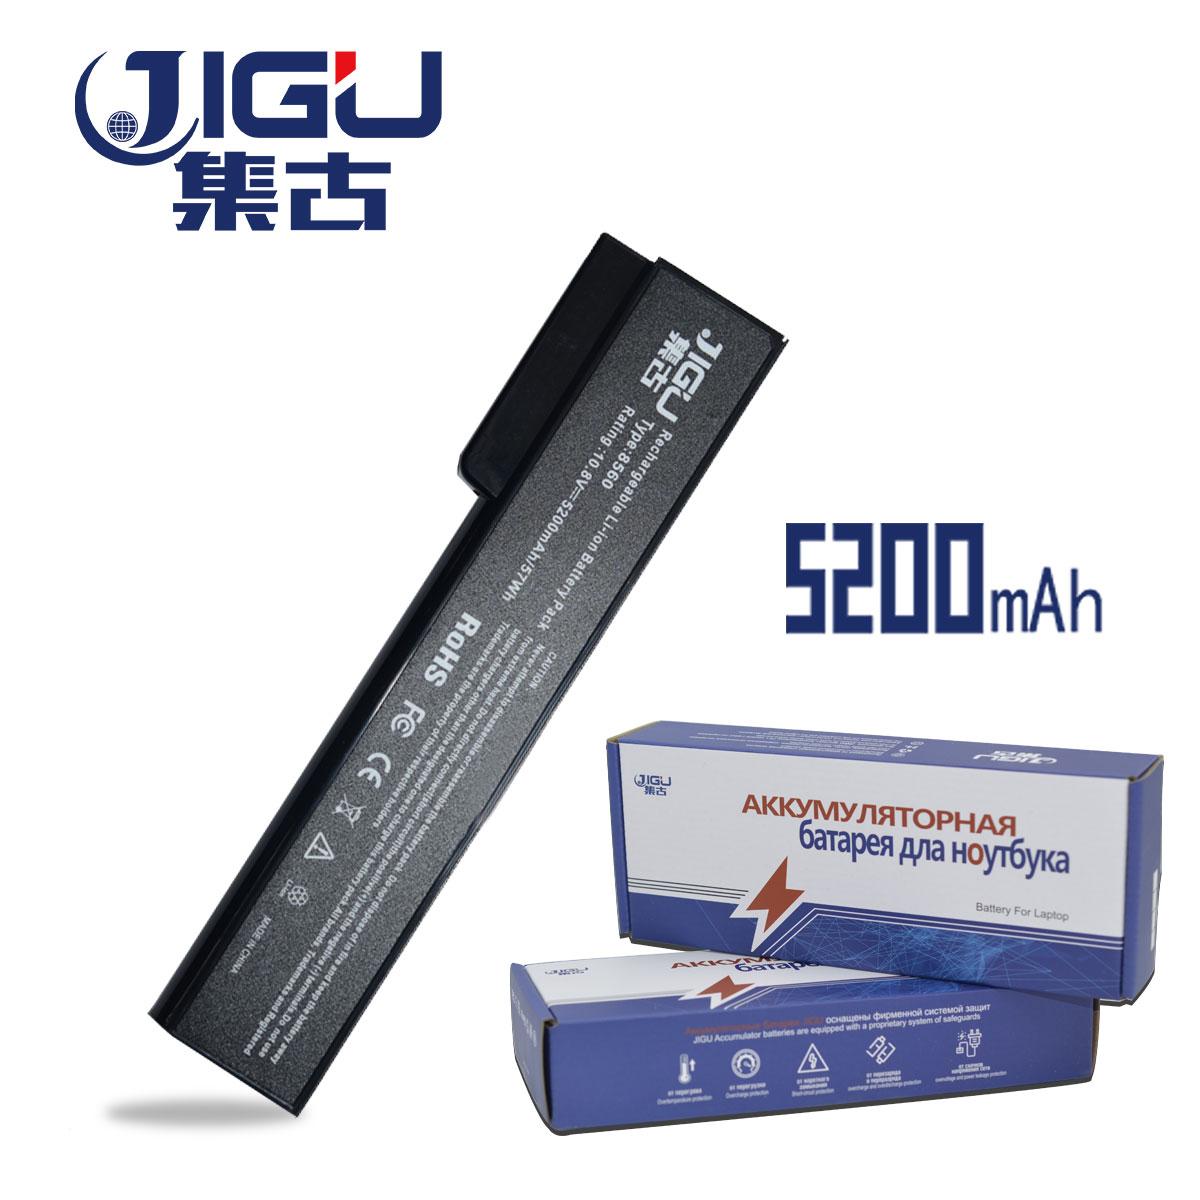 все цены на JIGU 6 Cells Laptop Battery For HP 628369-421 8460 CC06XL 628664-001 For EliteBook 8460w 8470p 8460p 8470w 8560p 8570p онлайн